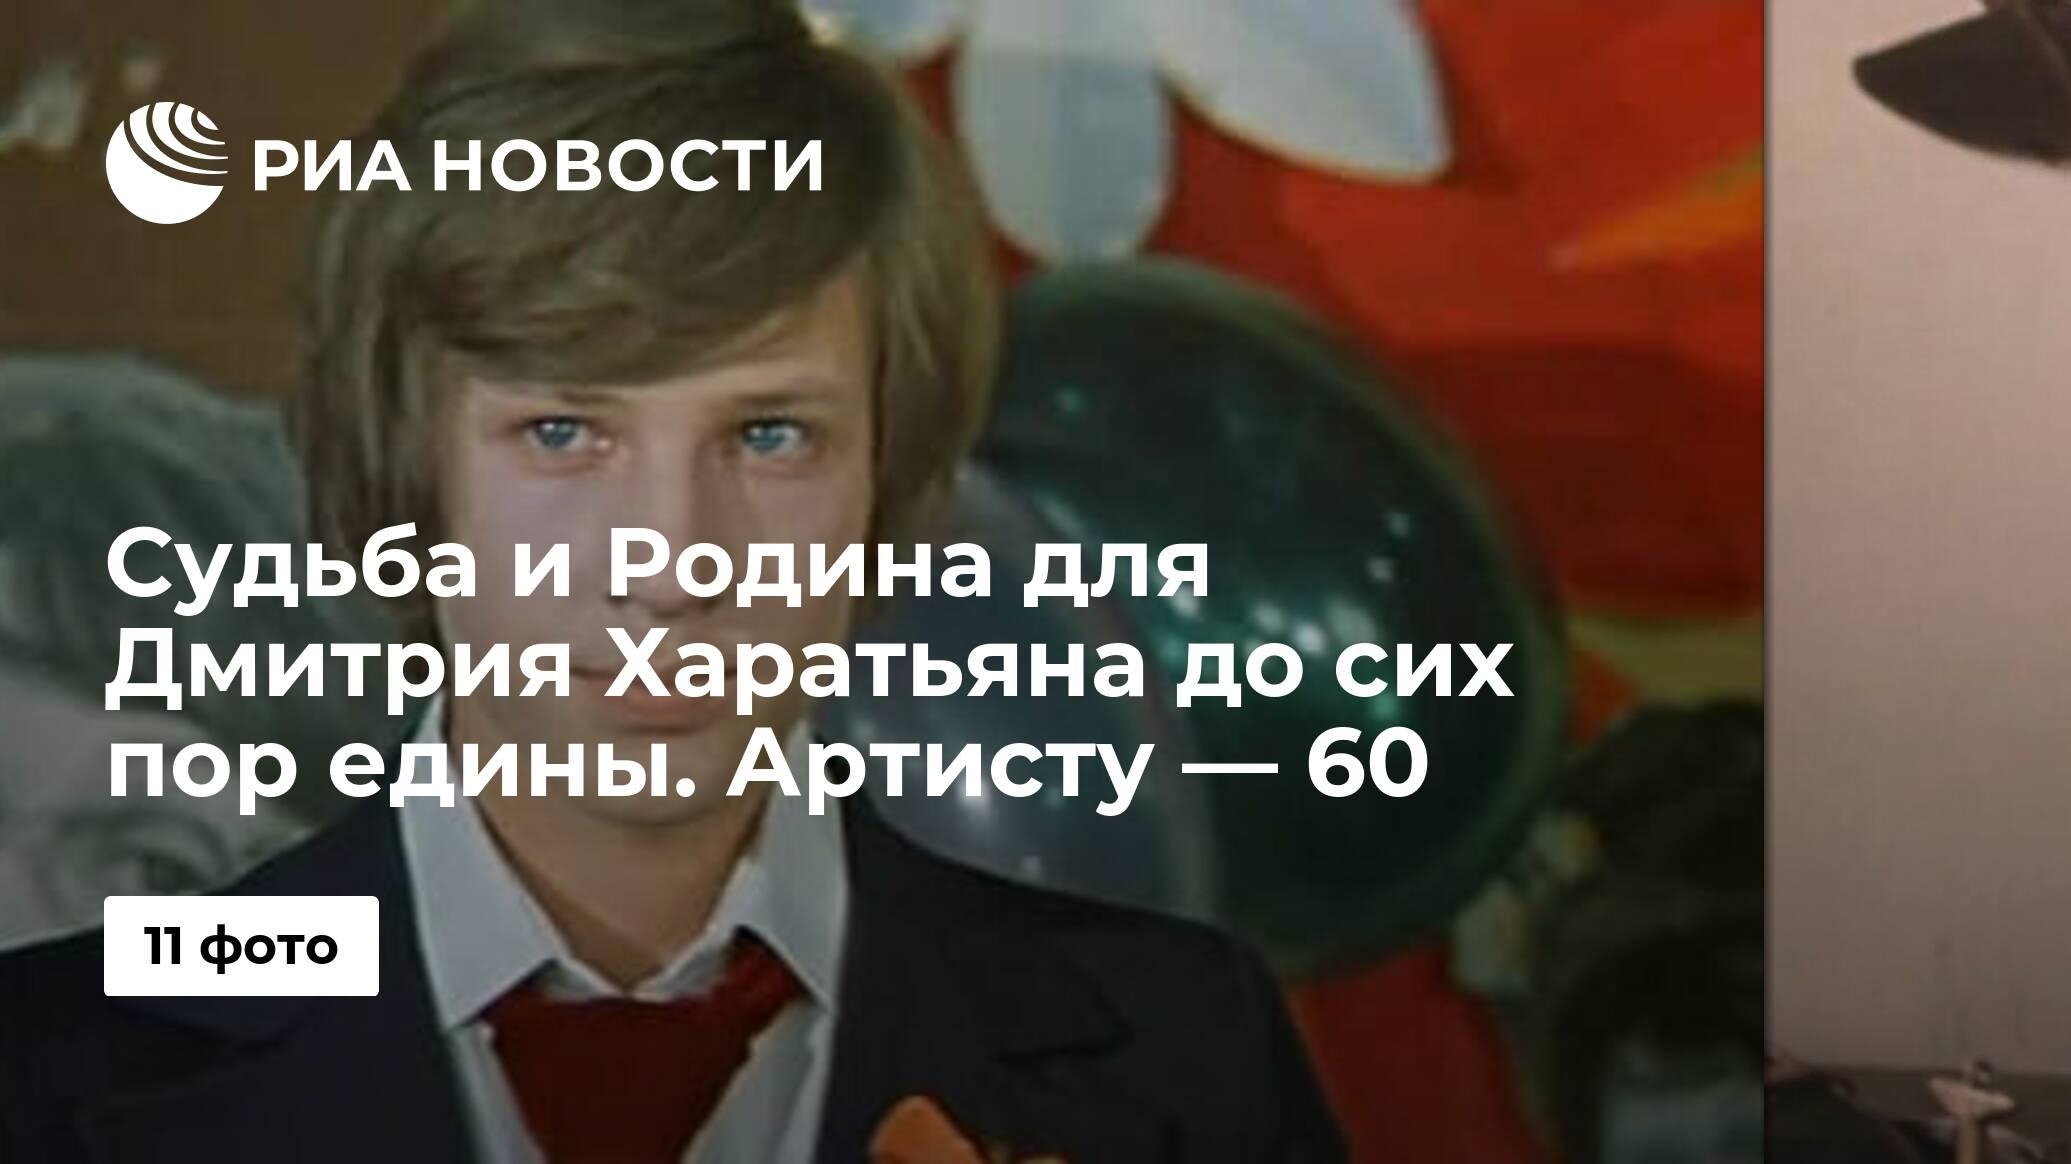 Судьба и Родина для Дмитрия Харатьяна до сих пор едины. Артисту — 60 - РИА Новости